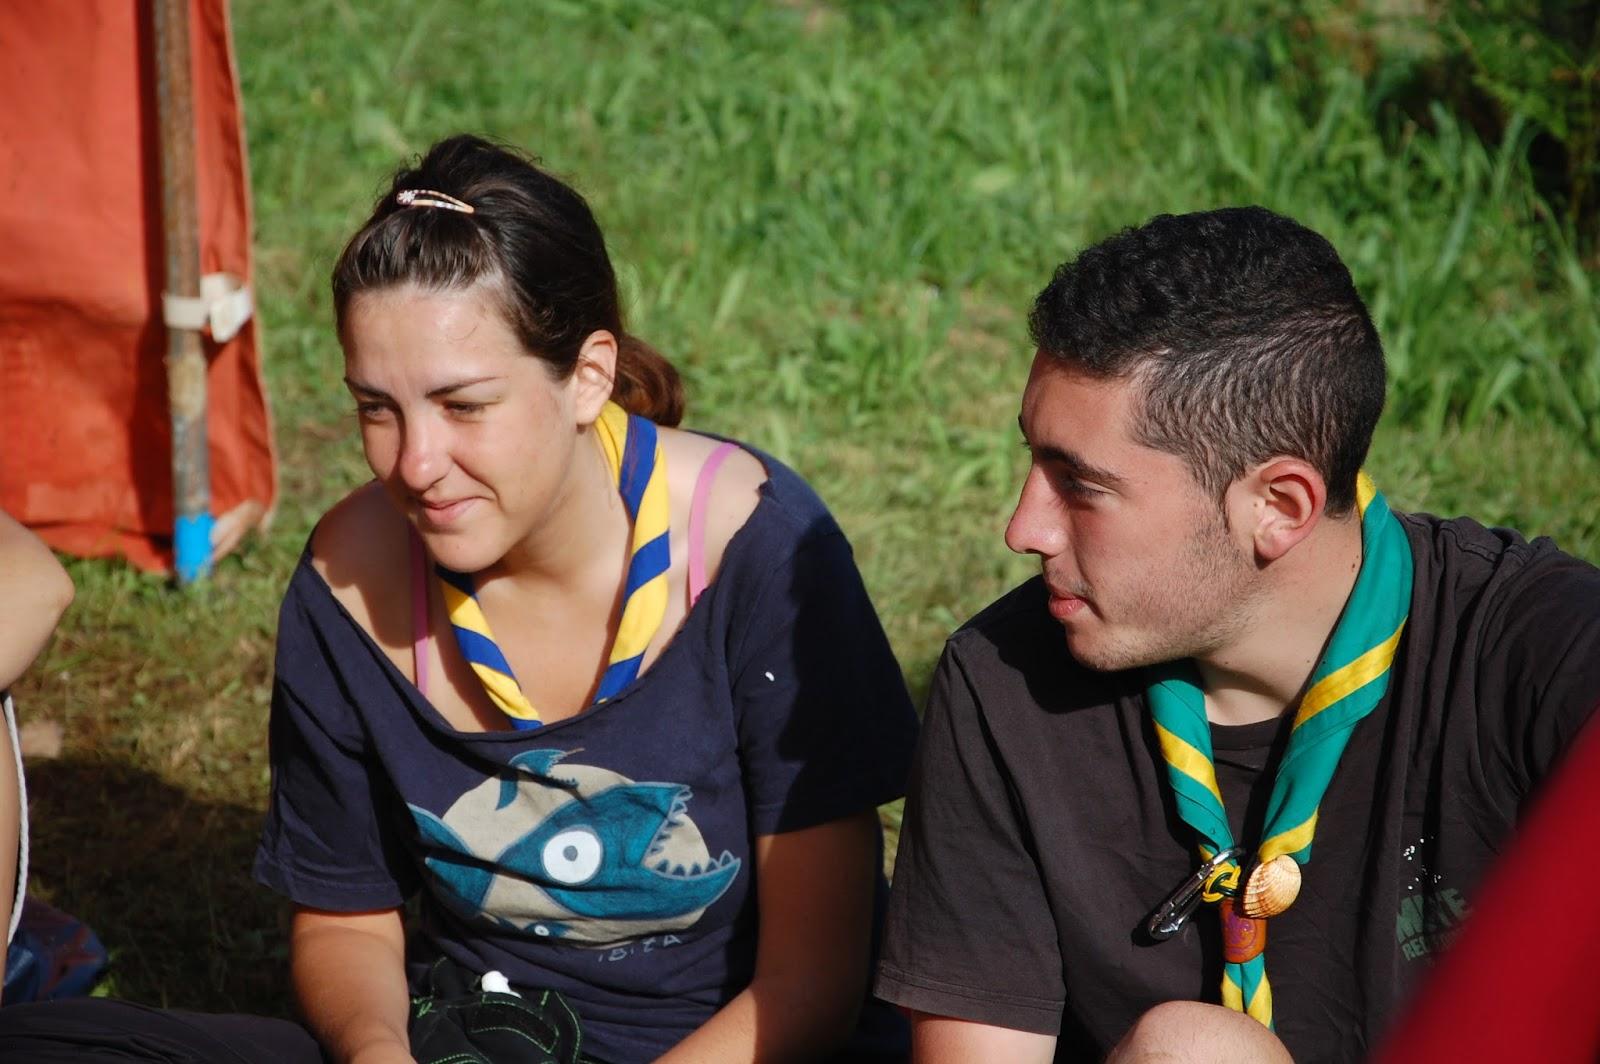 Campaments Estiu RolandKing 2011 - DSC_0042.JPG